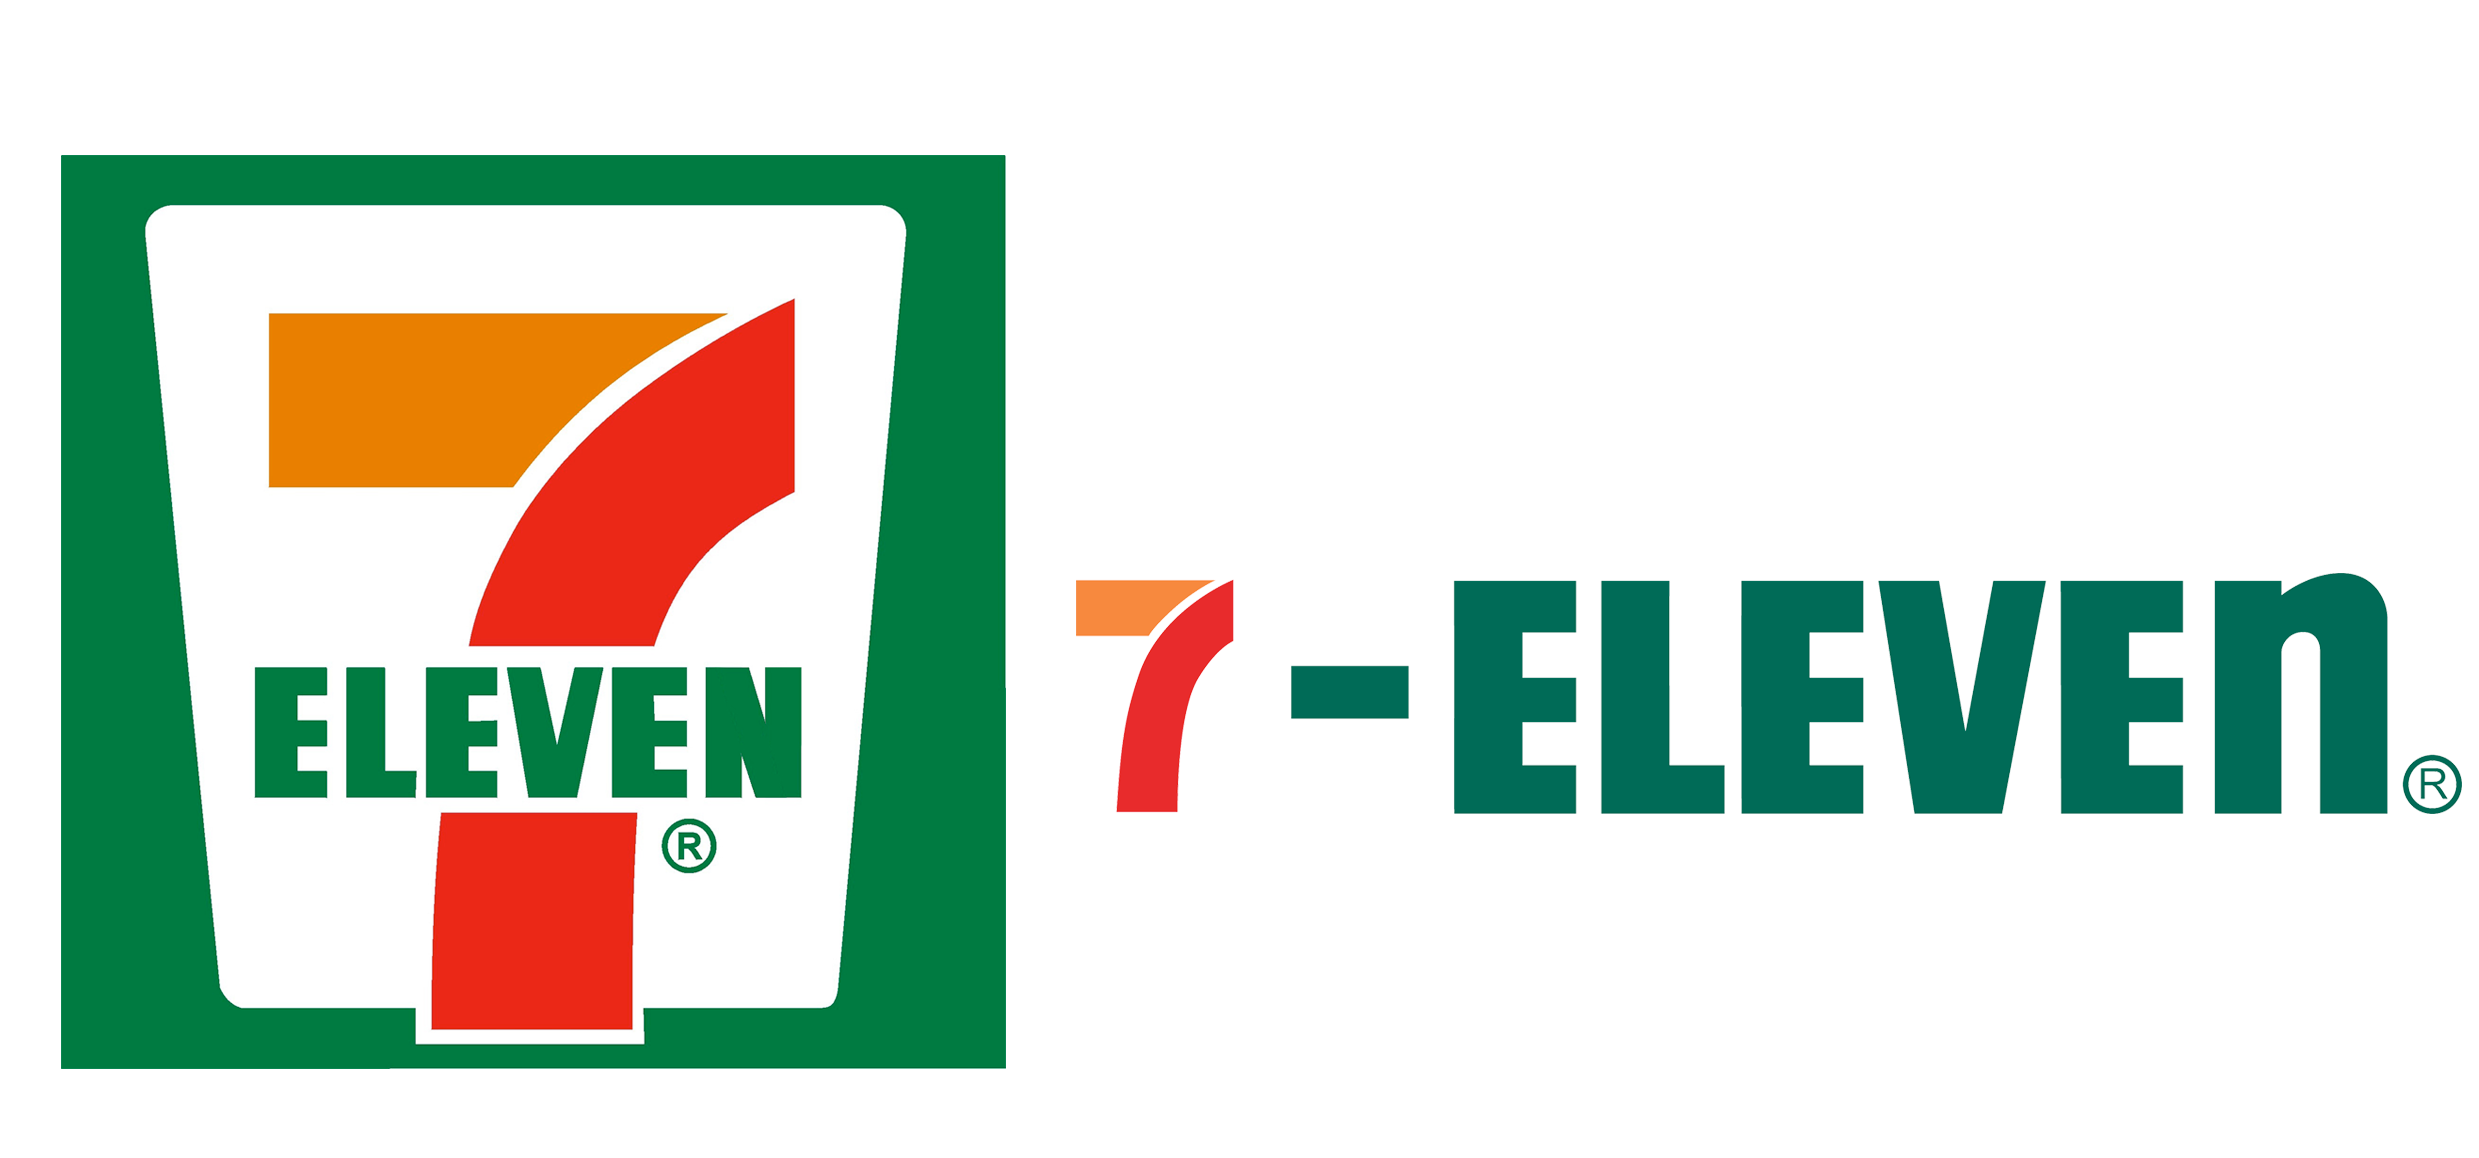 7 eleven logo png 8 » PNG Image.